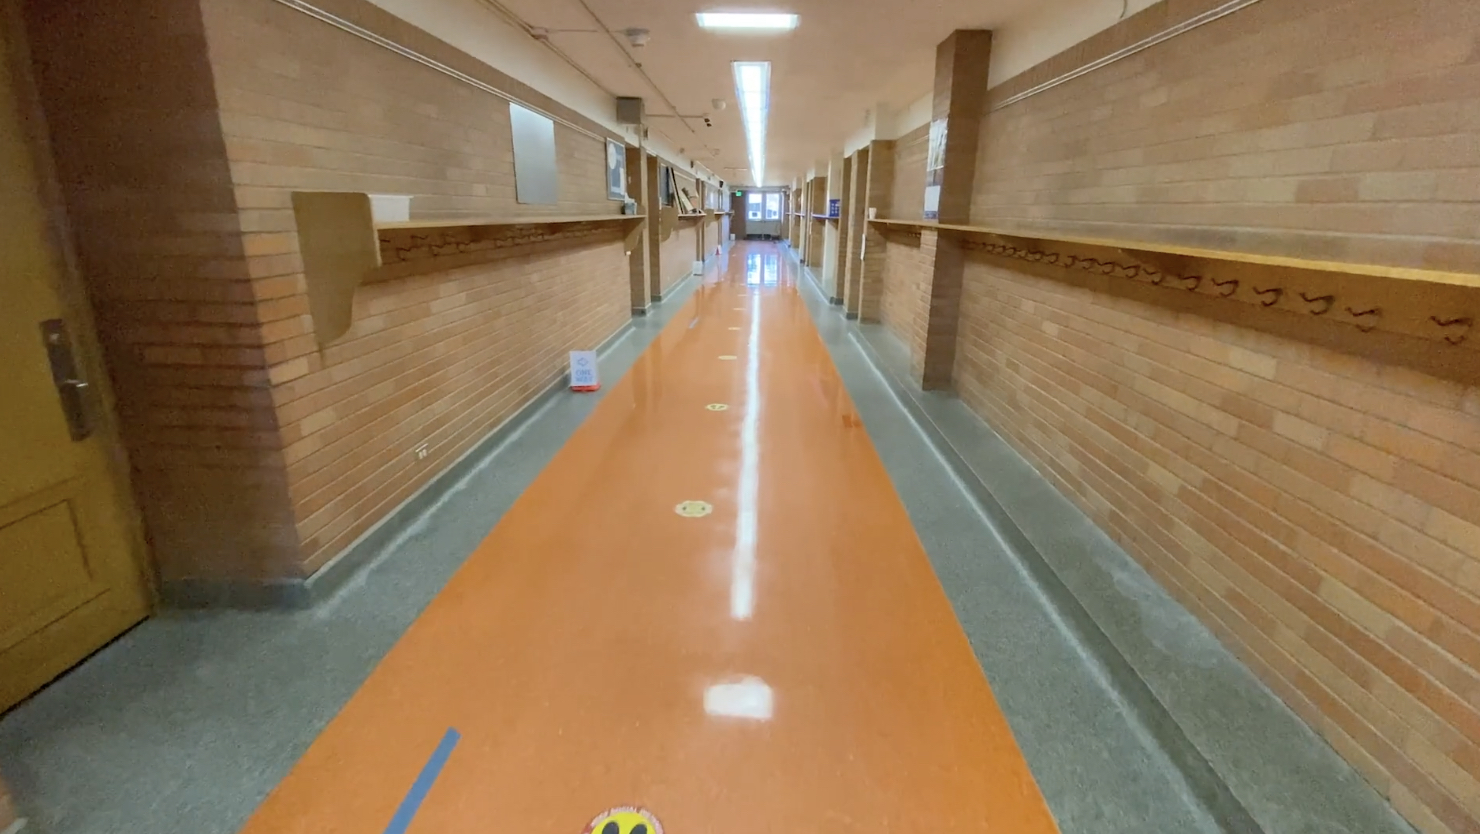 Odyssey Charter Elementary School Denver Homes For Sale Hallway